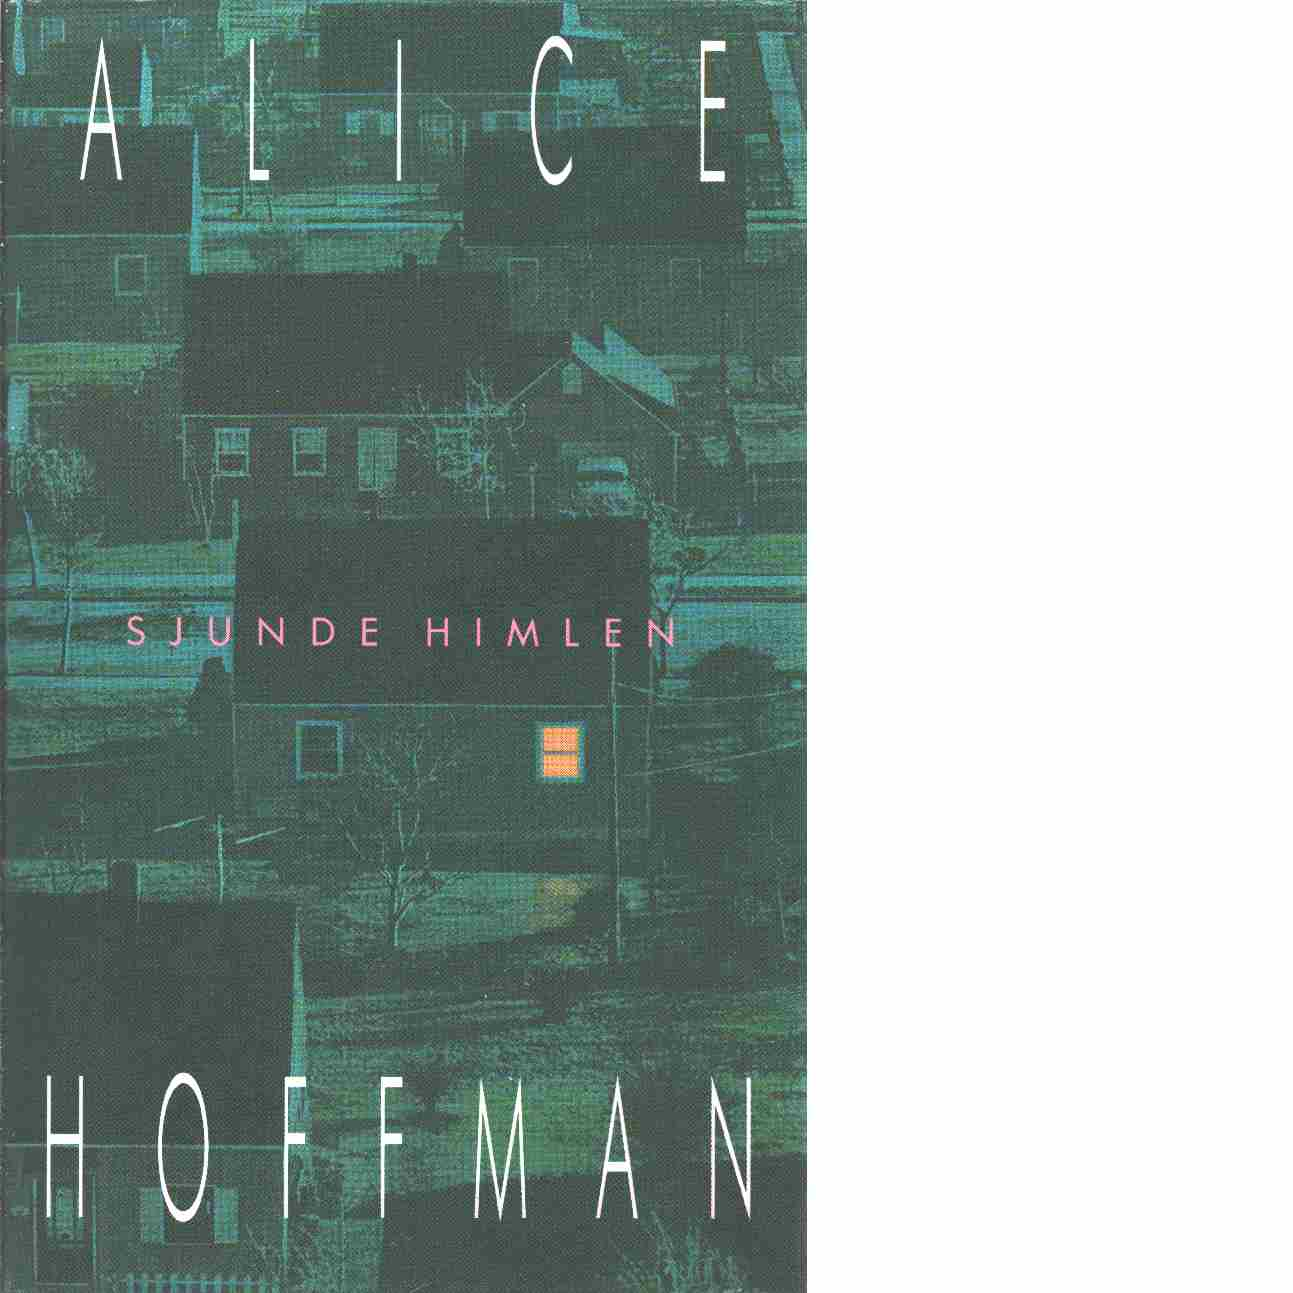 Sjunde himlen - Hoffman, Alice